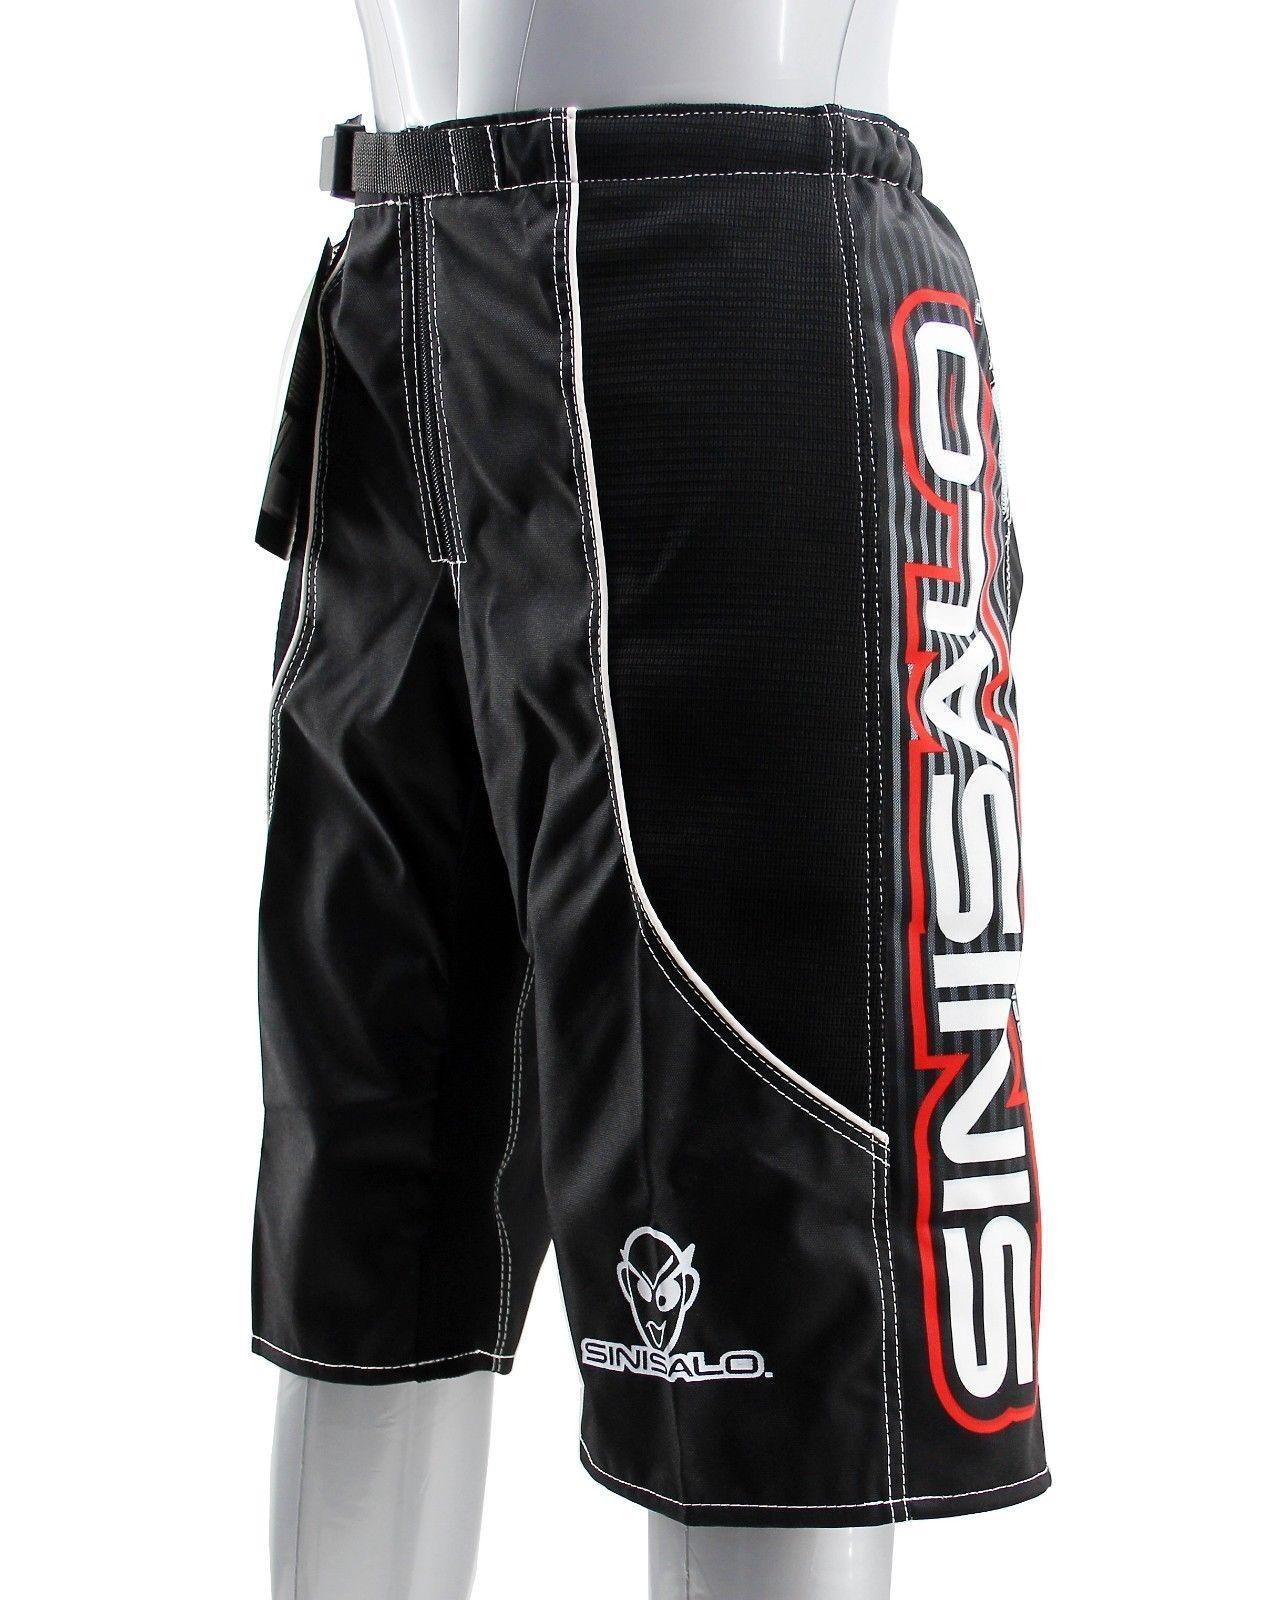 Sinisalo Gr.28 MTB Shorts, Schwarzm, Gr.28 Sinisalo 68f85a